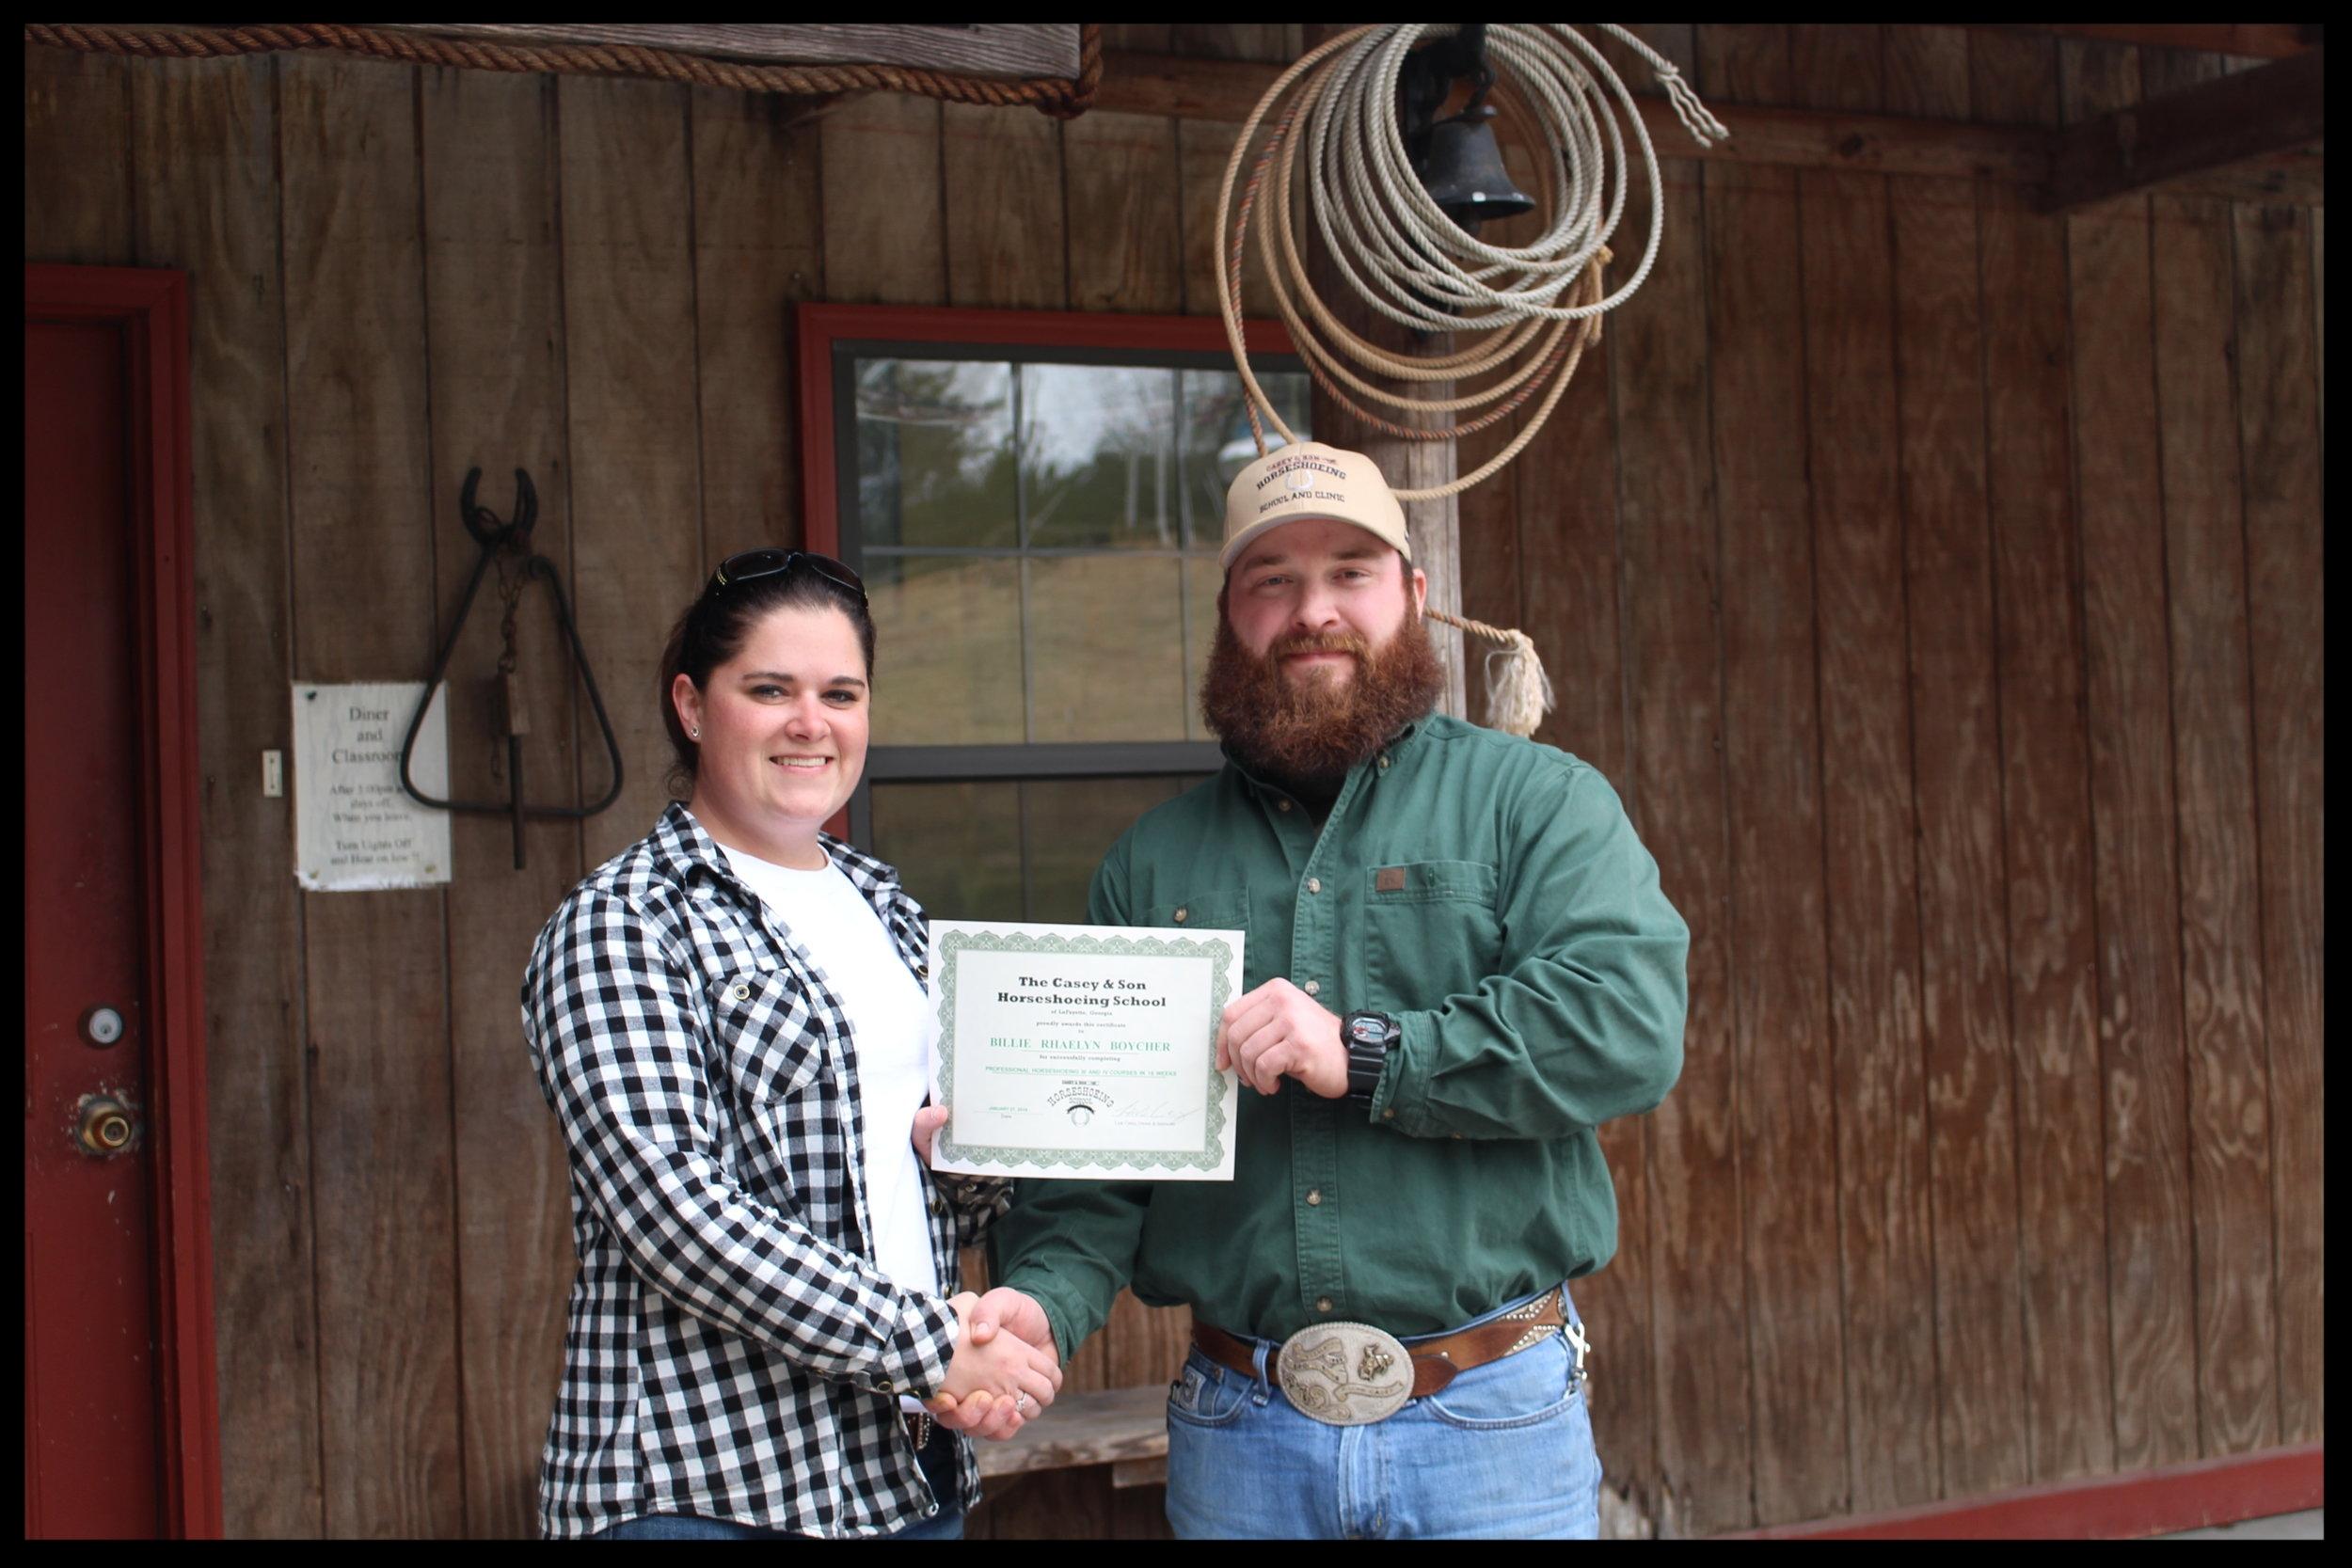 Casey & Son Horseshoeing School graduate farrier Rhaelyn Boycher of Georgia with Link Casey 1.27.2018